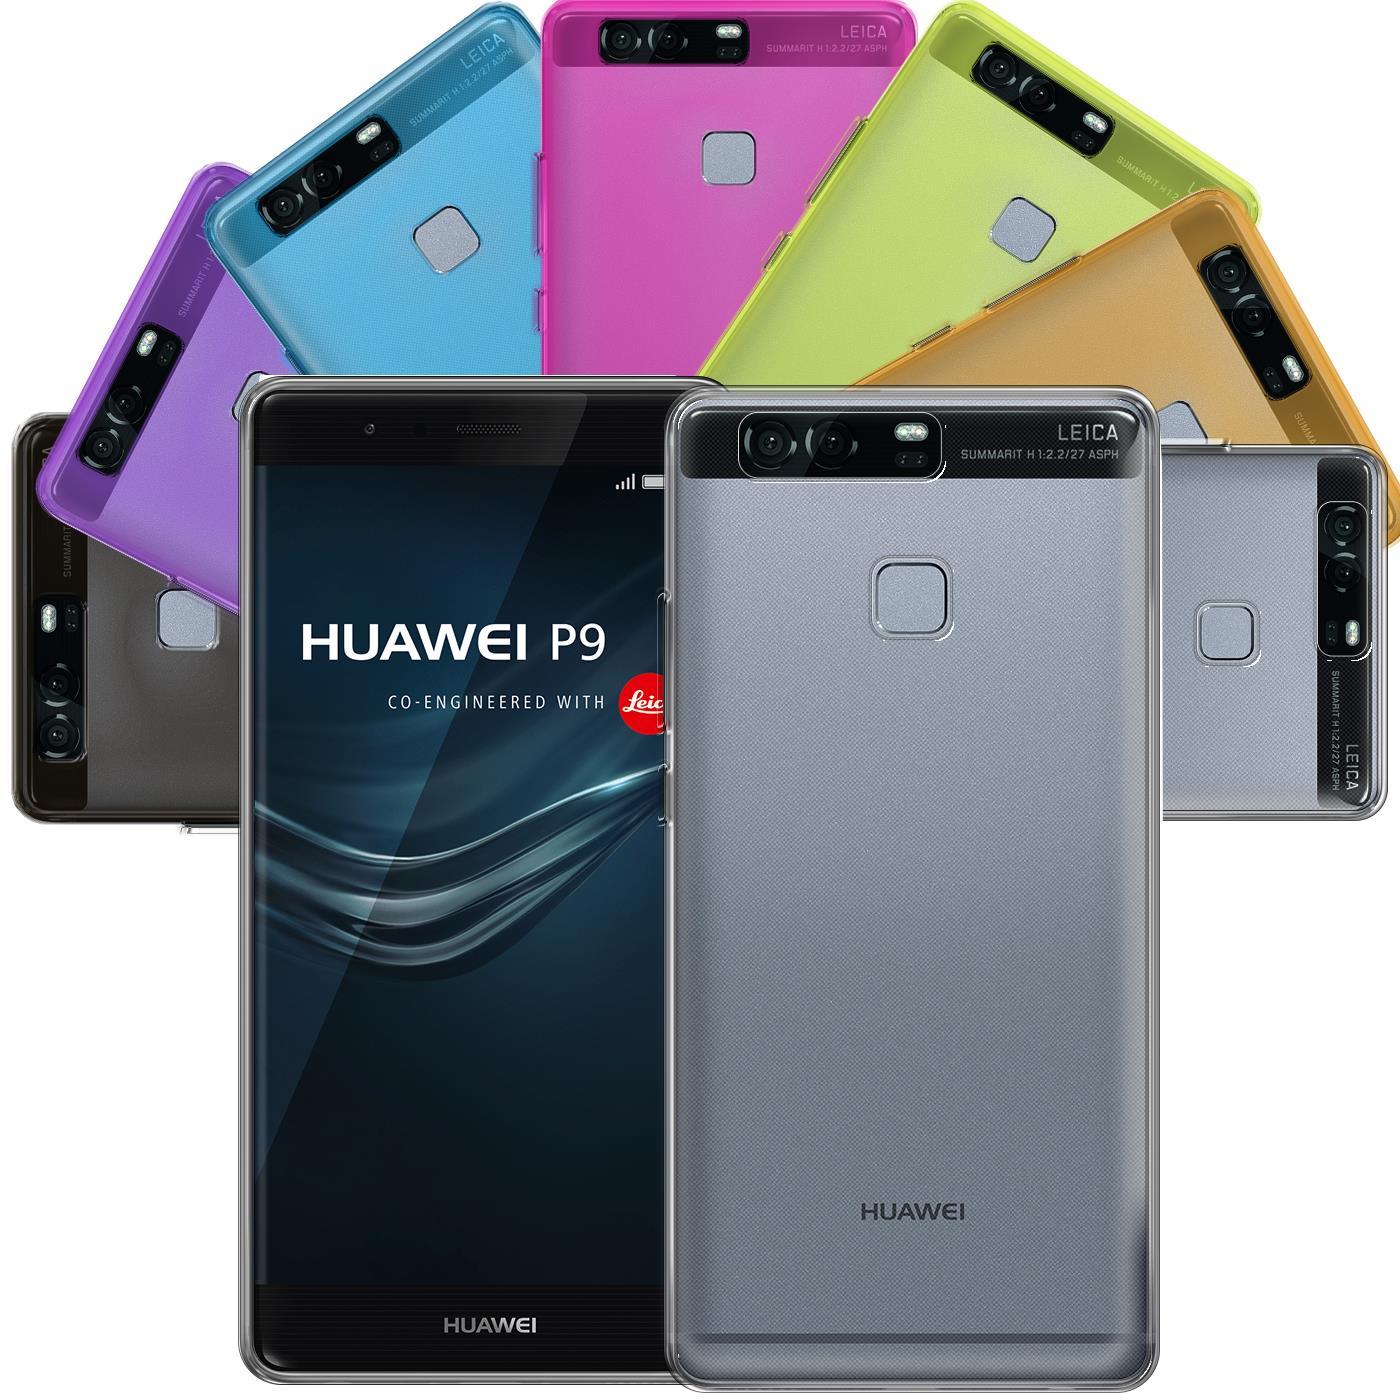 Huawei-p9-Duenn-Silikon-Klar-Case-Cover-Ultra-Slim-Stossfeste-Gel-Rueckseite